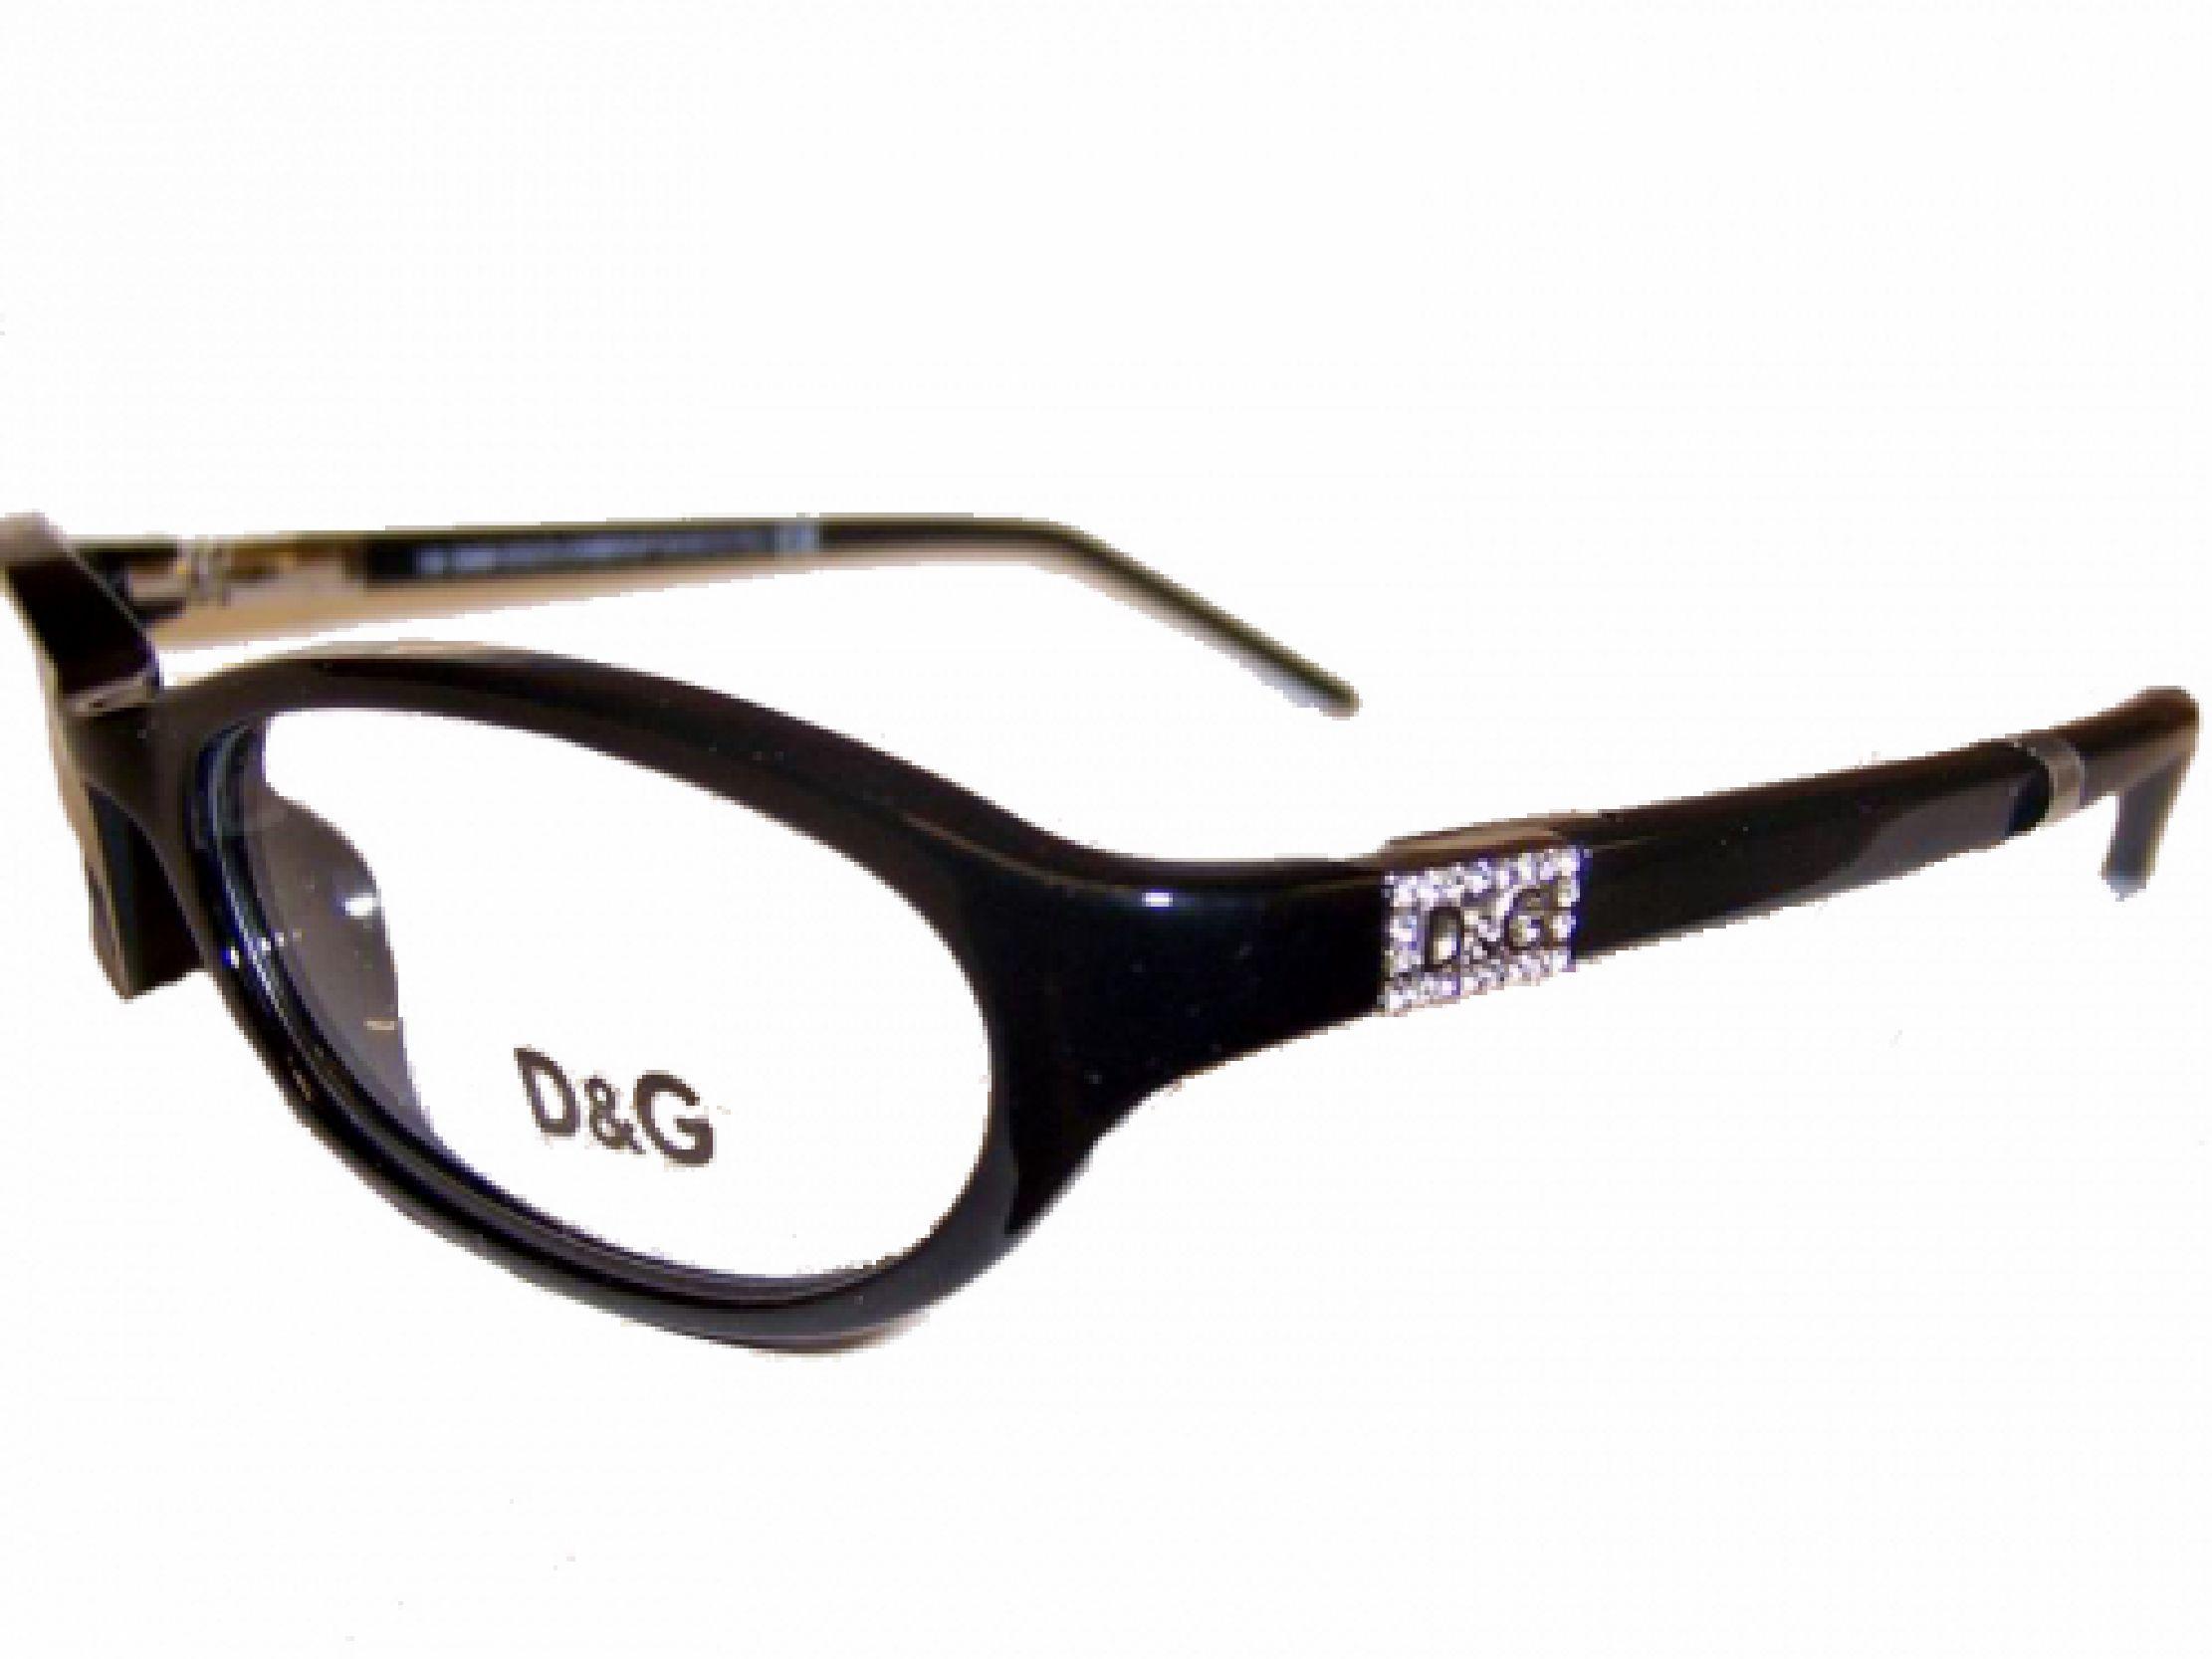 Gafas Dolce Gabbana DG | Monturas - gafas graduadas | Pinterest ...